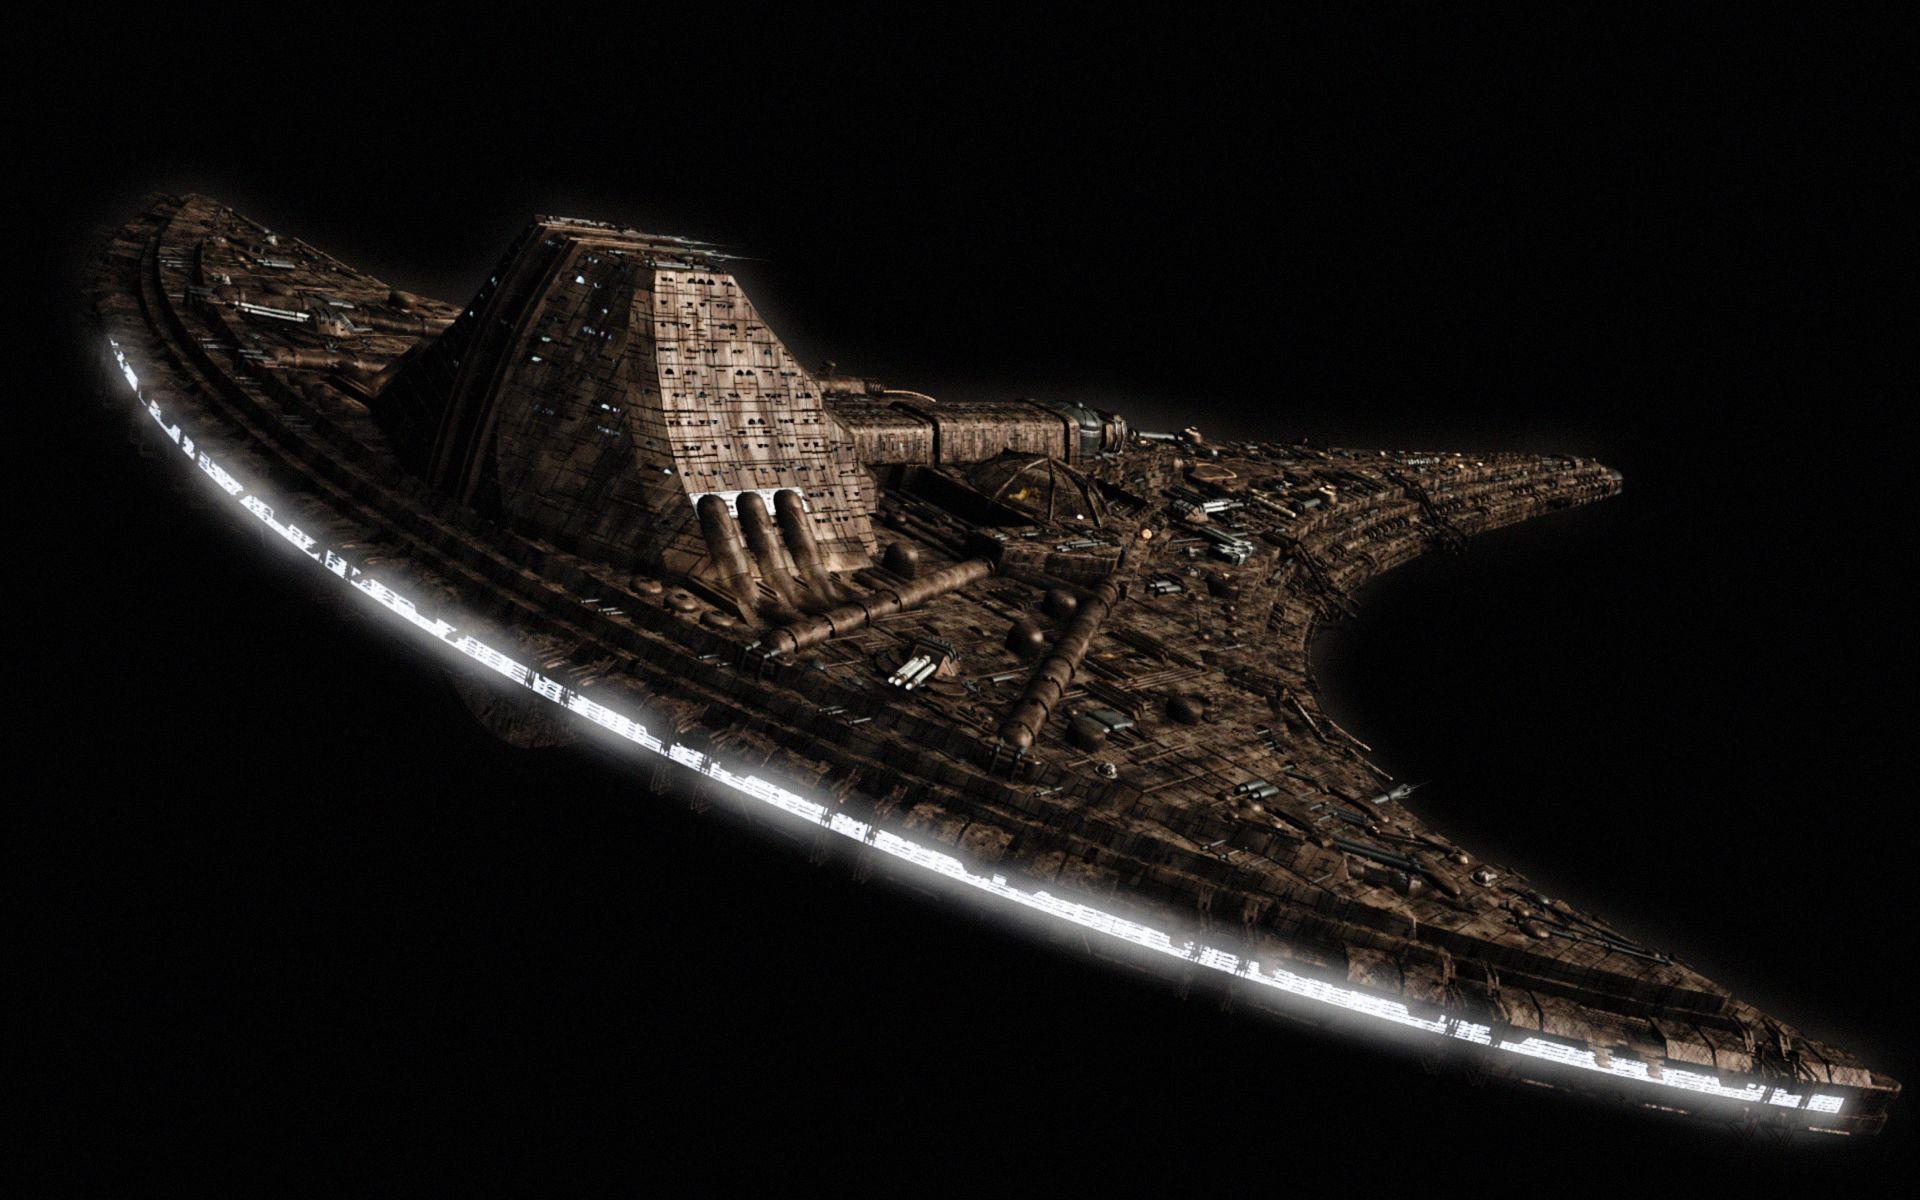 Hd wallpaper universe - 41 Stargate Universe Hd Wallpapers Backgrounds Wallpaper Abyss